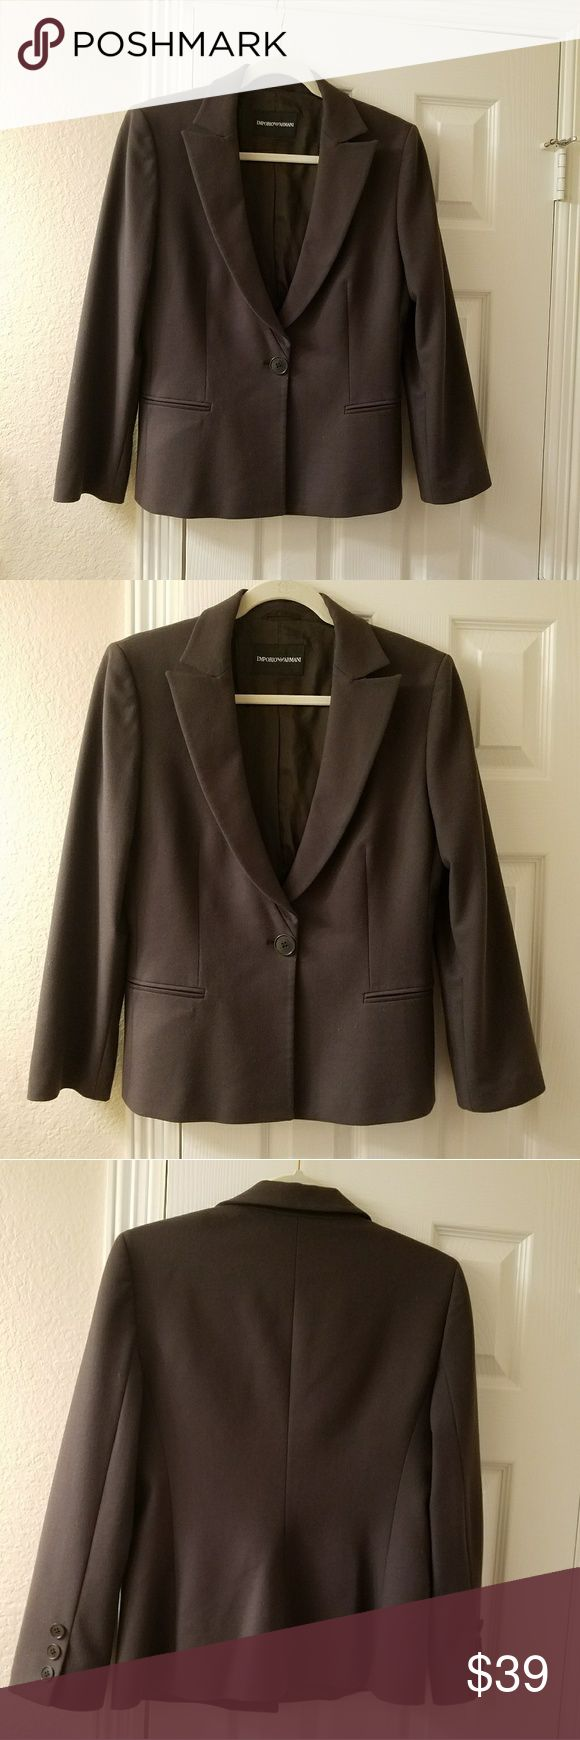 "Emporio Armani women's suit , jacket,  blazer, IT In great condition,  Emporio Armani women's suit , jacket,  blazer, IT 46, made in Italy Length.        24,5"" Shoulders.  16,5"" Armpit to armpit 19"" Waist.    16,5"" Sleeve.   22,5"" ANTINEA SRL RN 103723 84%wool 15%poliamidica, 1%elastan Emporio Armani Jackets & Coats"